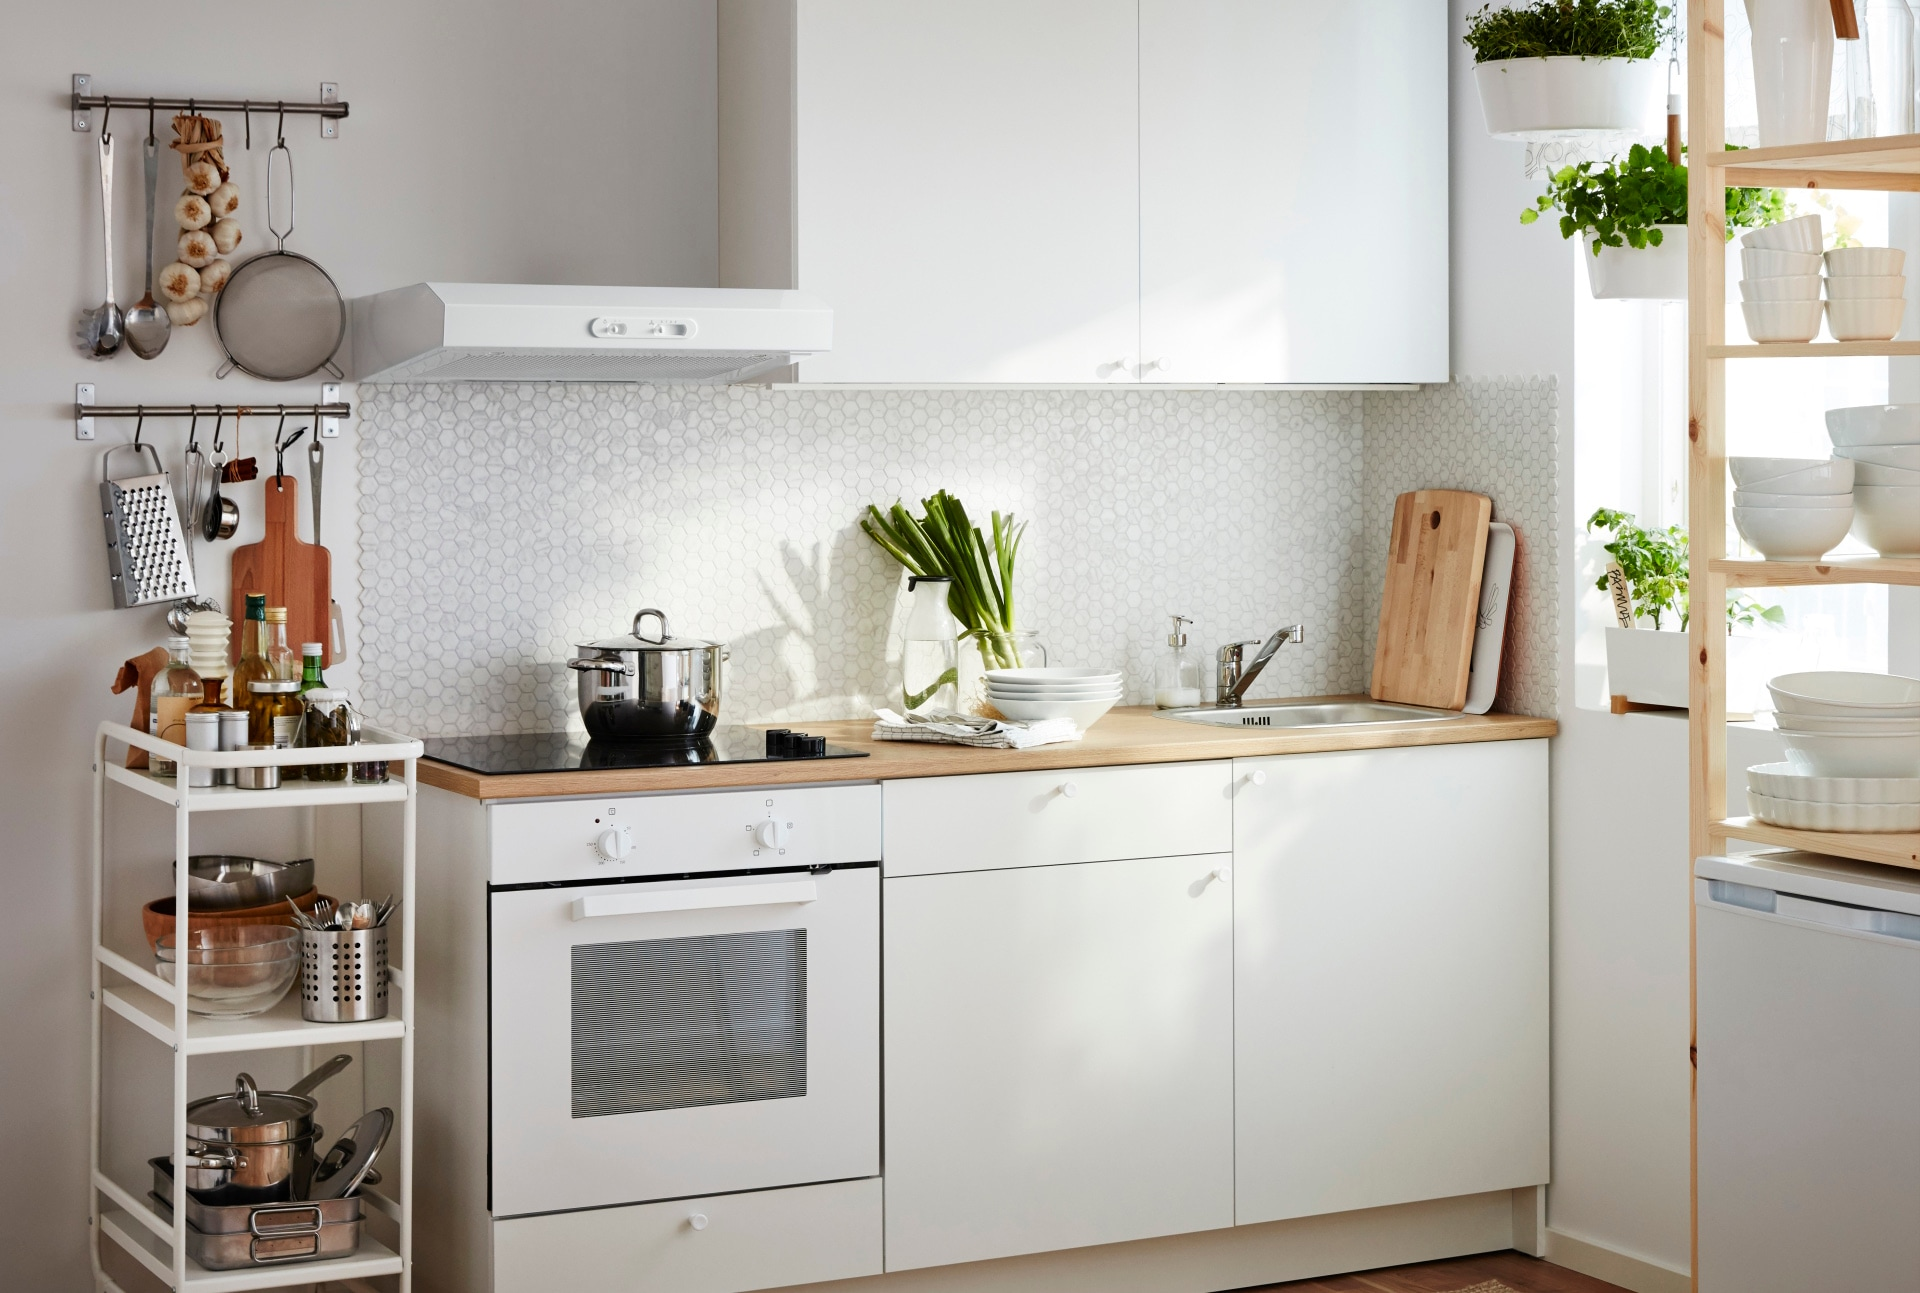 Full Size of Modulküche Ikea Edelstahlküche Gebraucht Edelstahl Garten Outdoor Küche Holz Wohnzimmer Modulküche Edelstahl